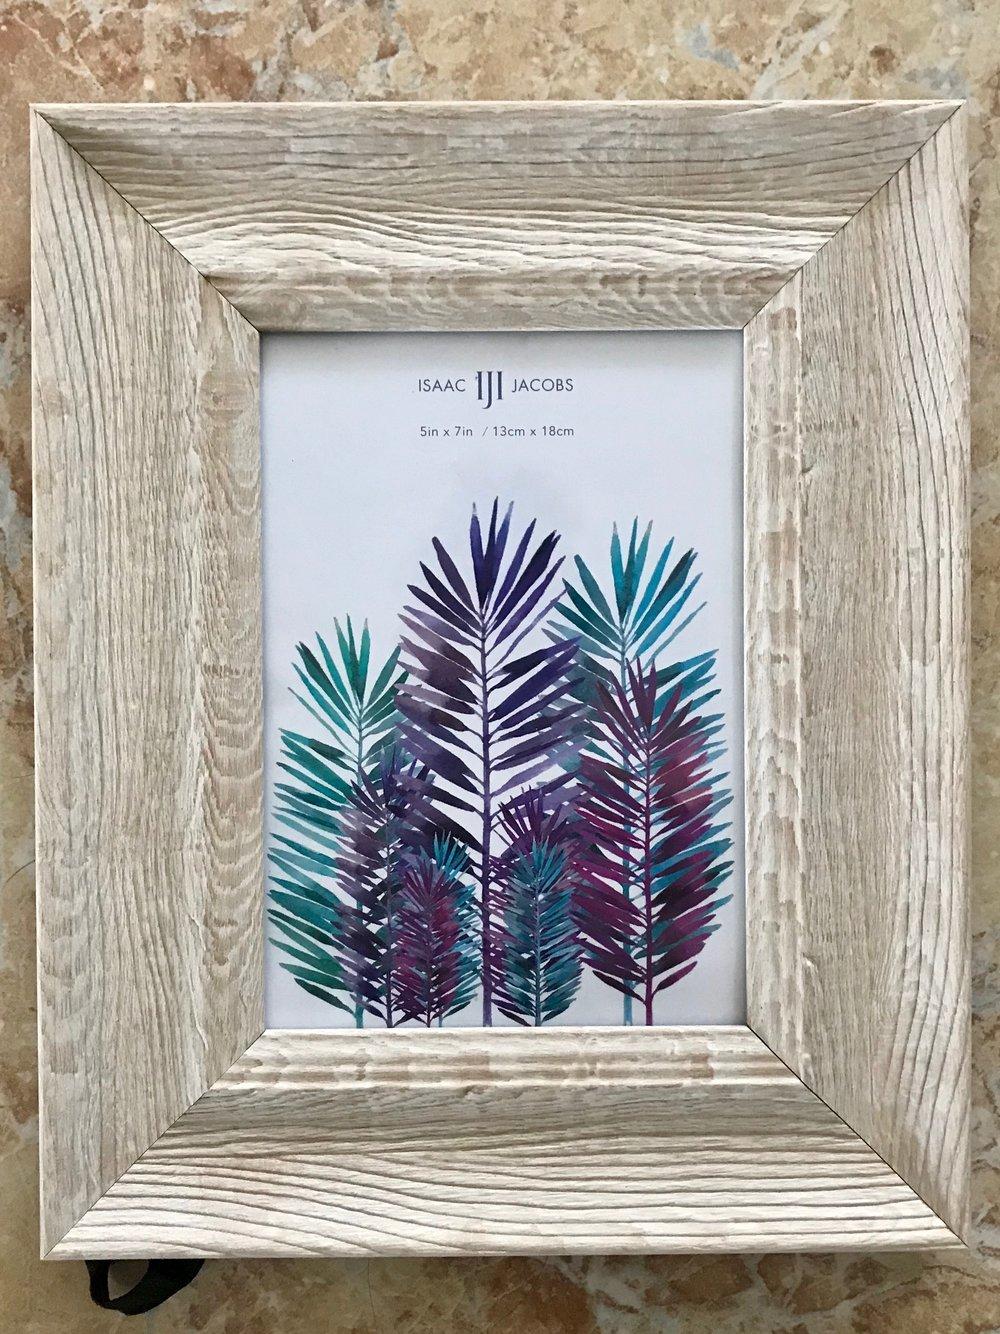 5x7 Wood Frame